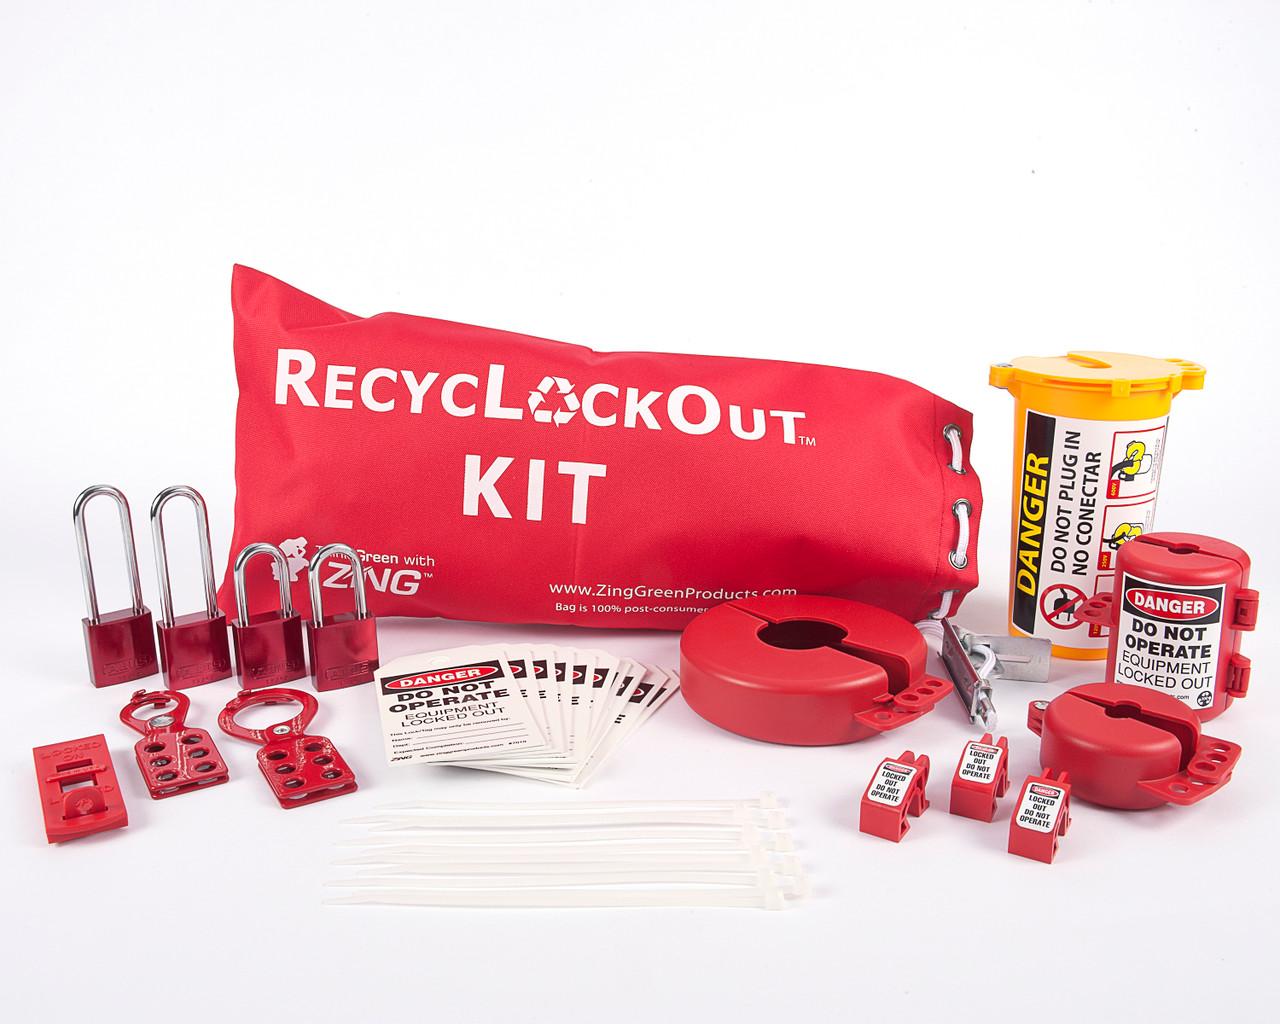 Lockout Tagout Bag Kit with Aluminum Locks, Red Drawstring Bag